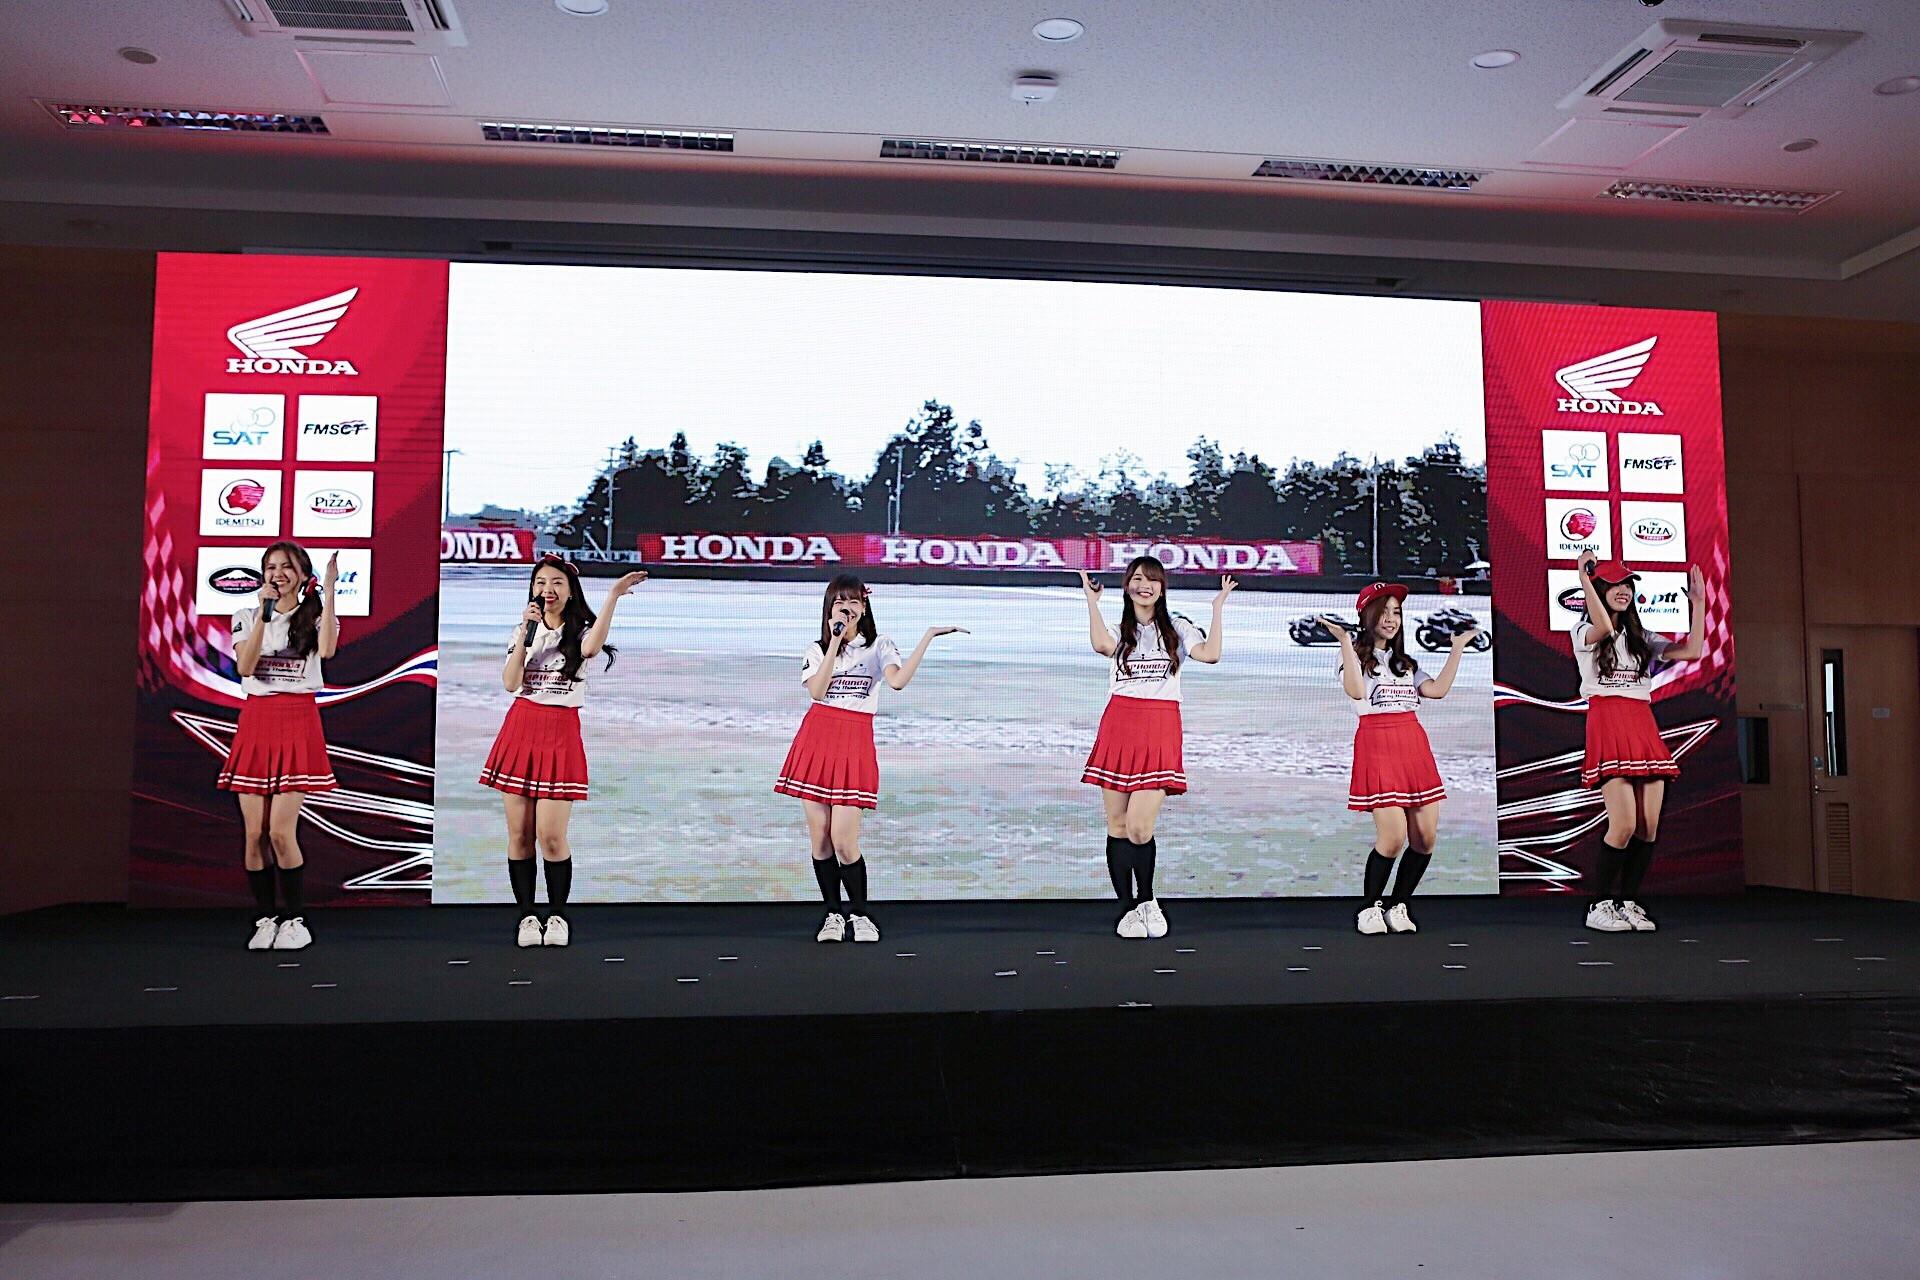 Honda-Motorcycle-มอเตอร์ไซค์-ฮอนด้า-motosport-2018-News-ข่าวประชาสัมพันธ์-press-release-bnk48